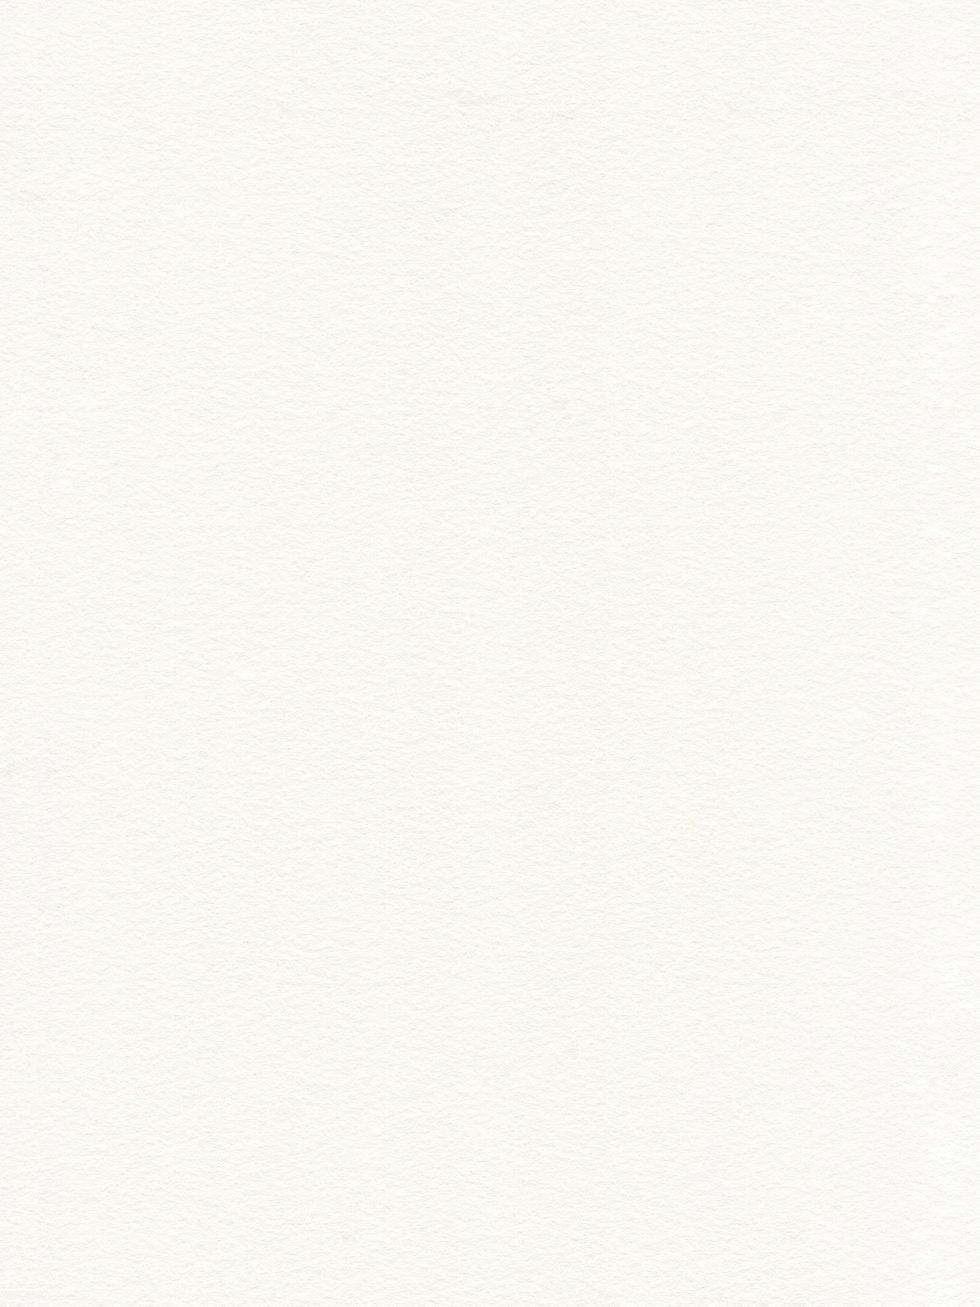 watercolor_paper_texture.jpg